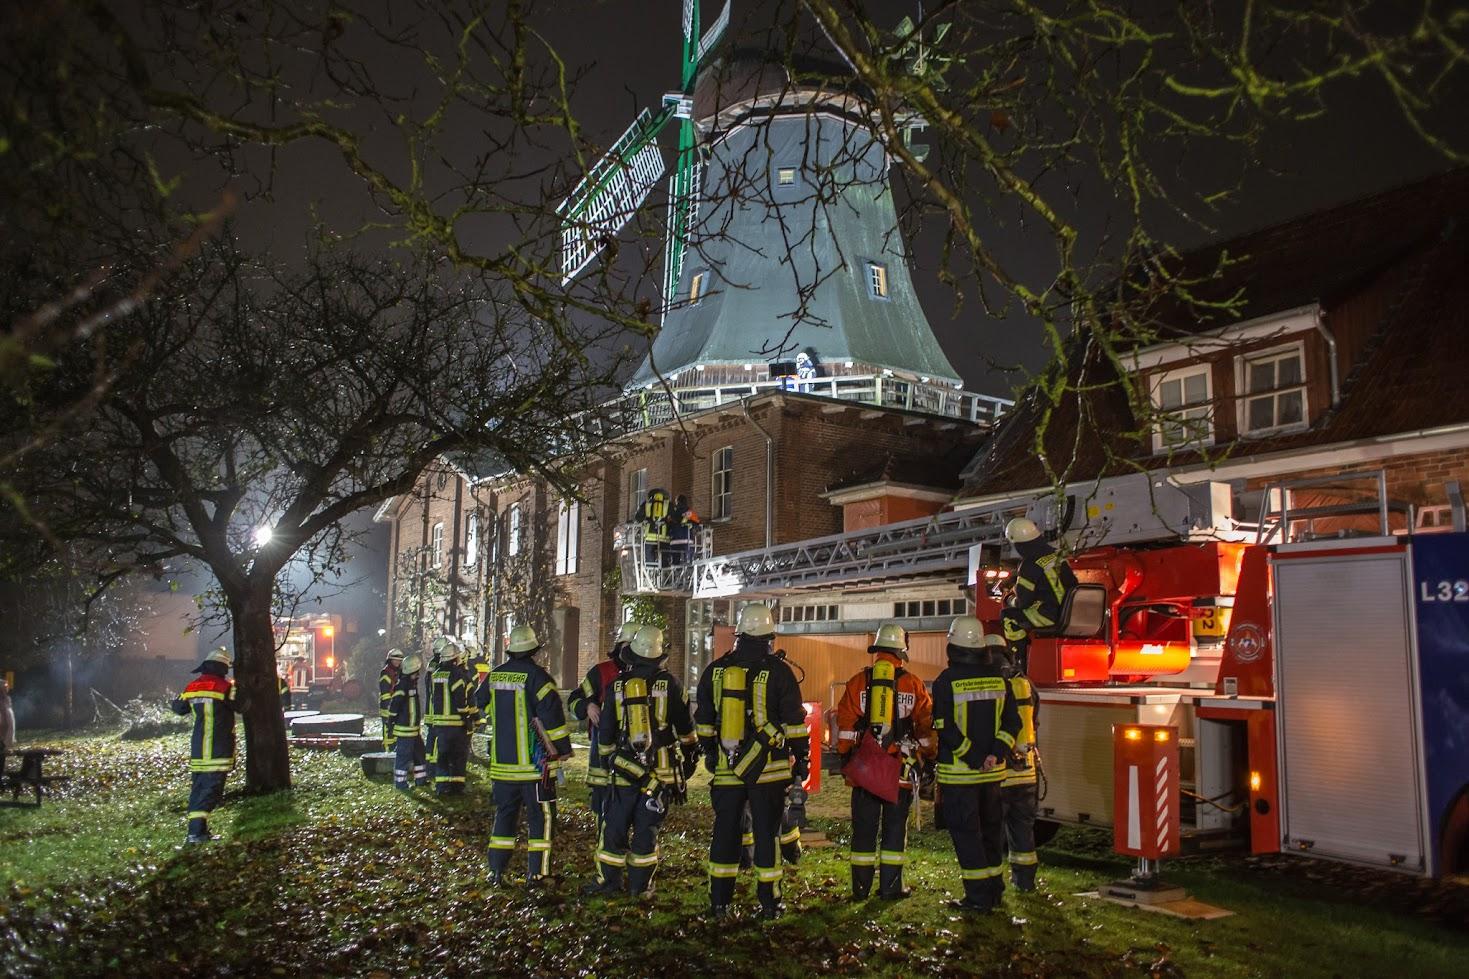 Feuerwehr-Übung in Osterholz-Scharmbeck